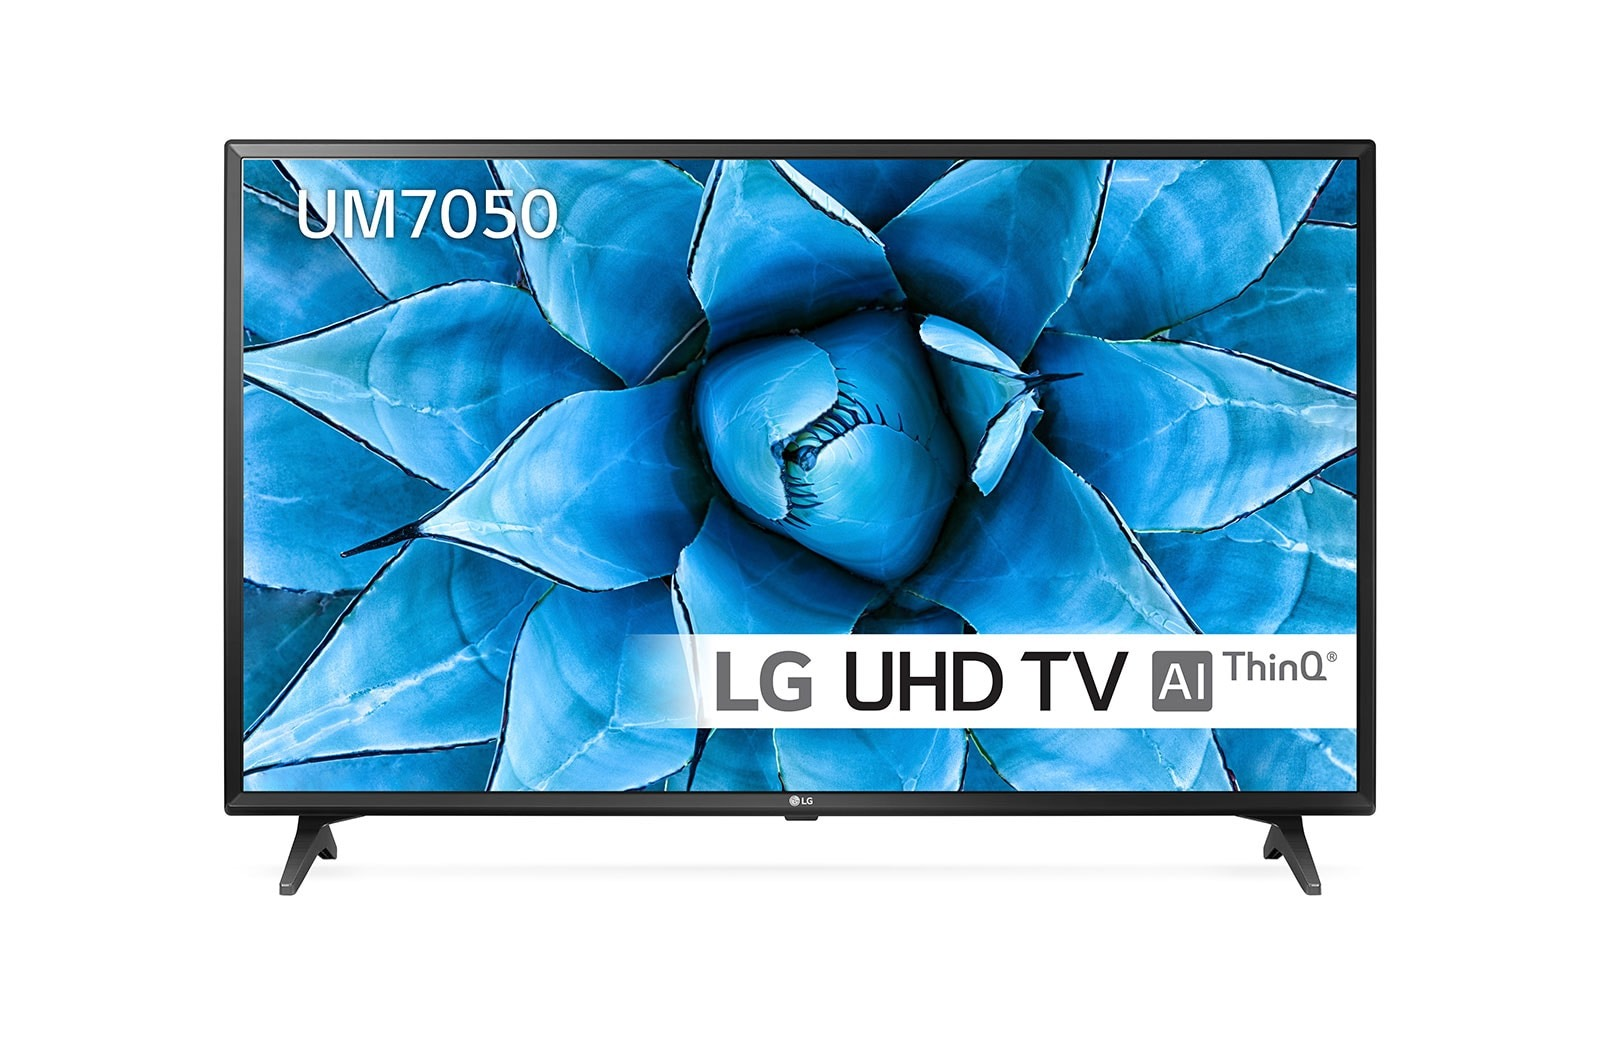 LG 43UM7050 43 inch UHD TV